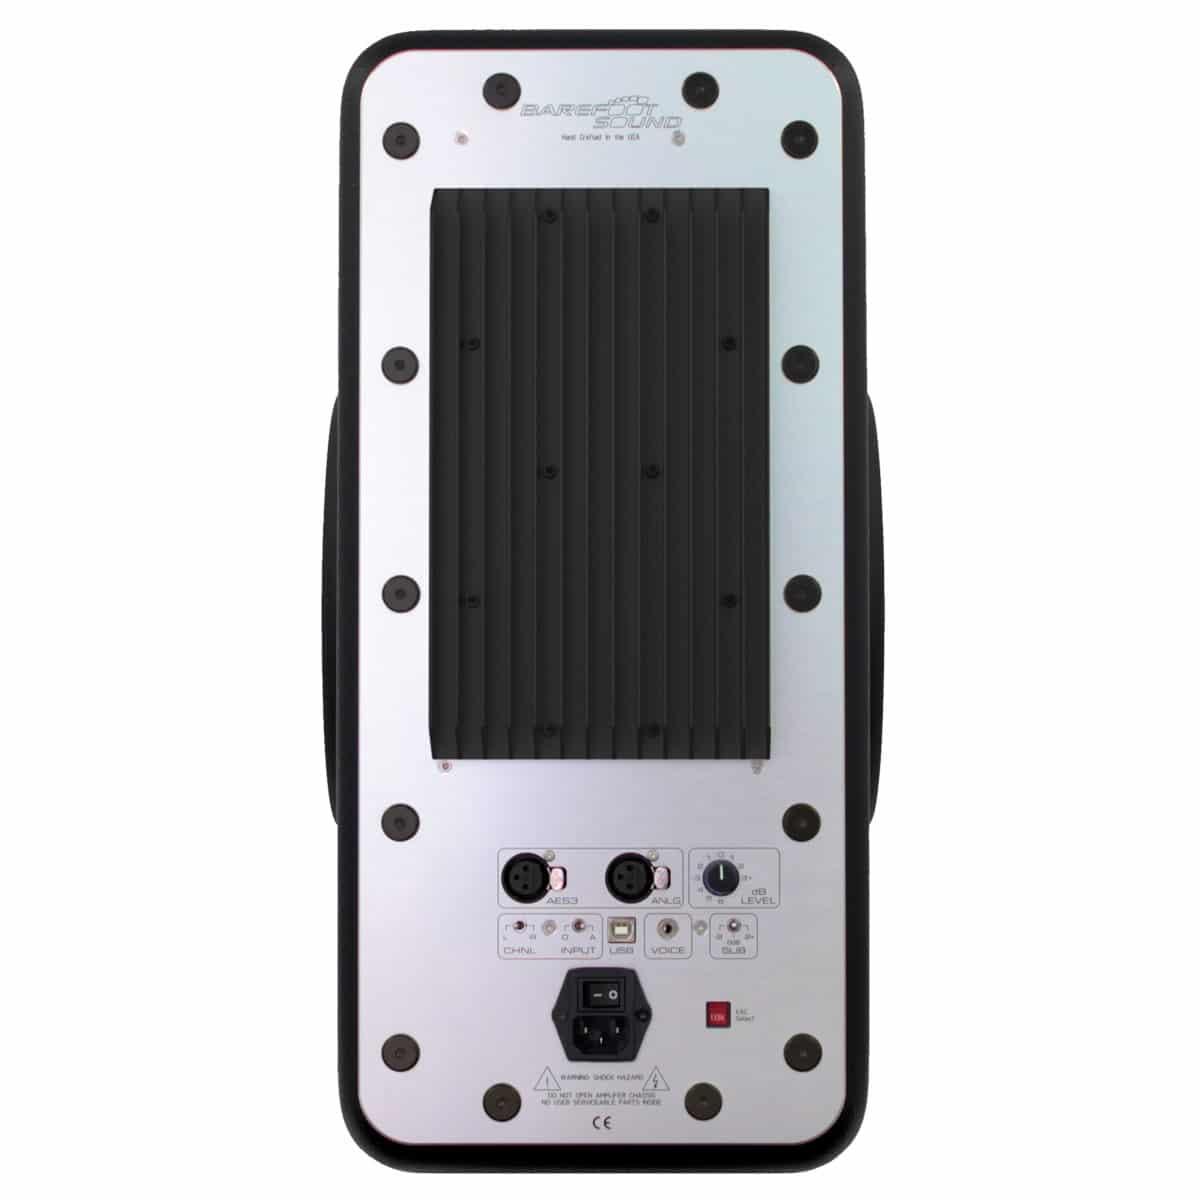 Barefoot Sound MicroMain 27 Gen2 Pro Audio, Audio Monitors, Studio Monitor Barefoot Sound Micromain 27 Gen2 9